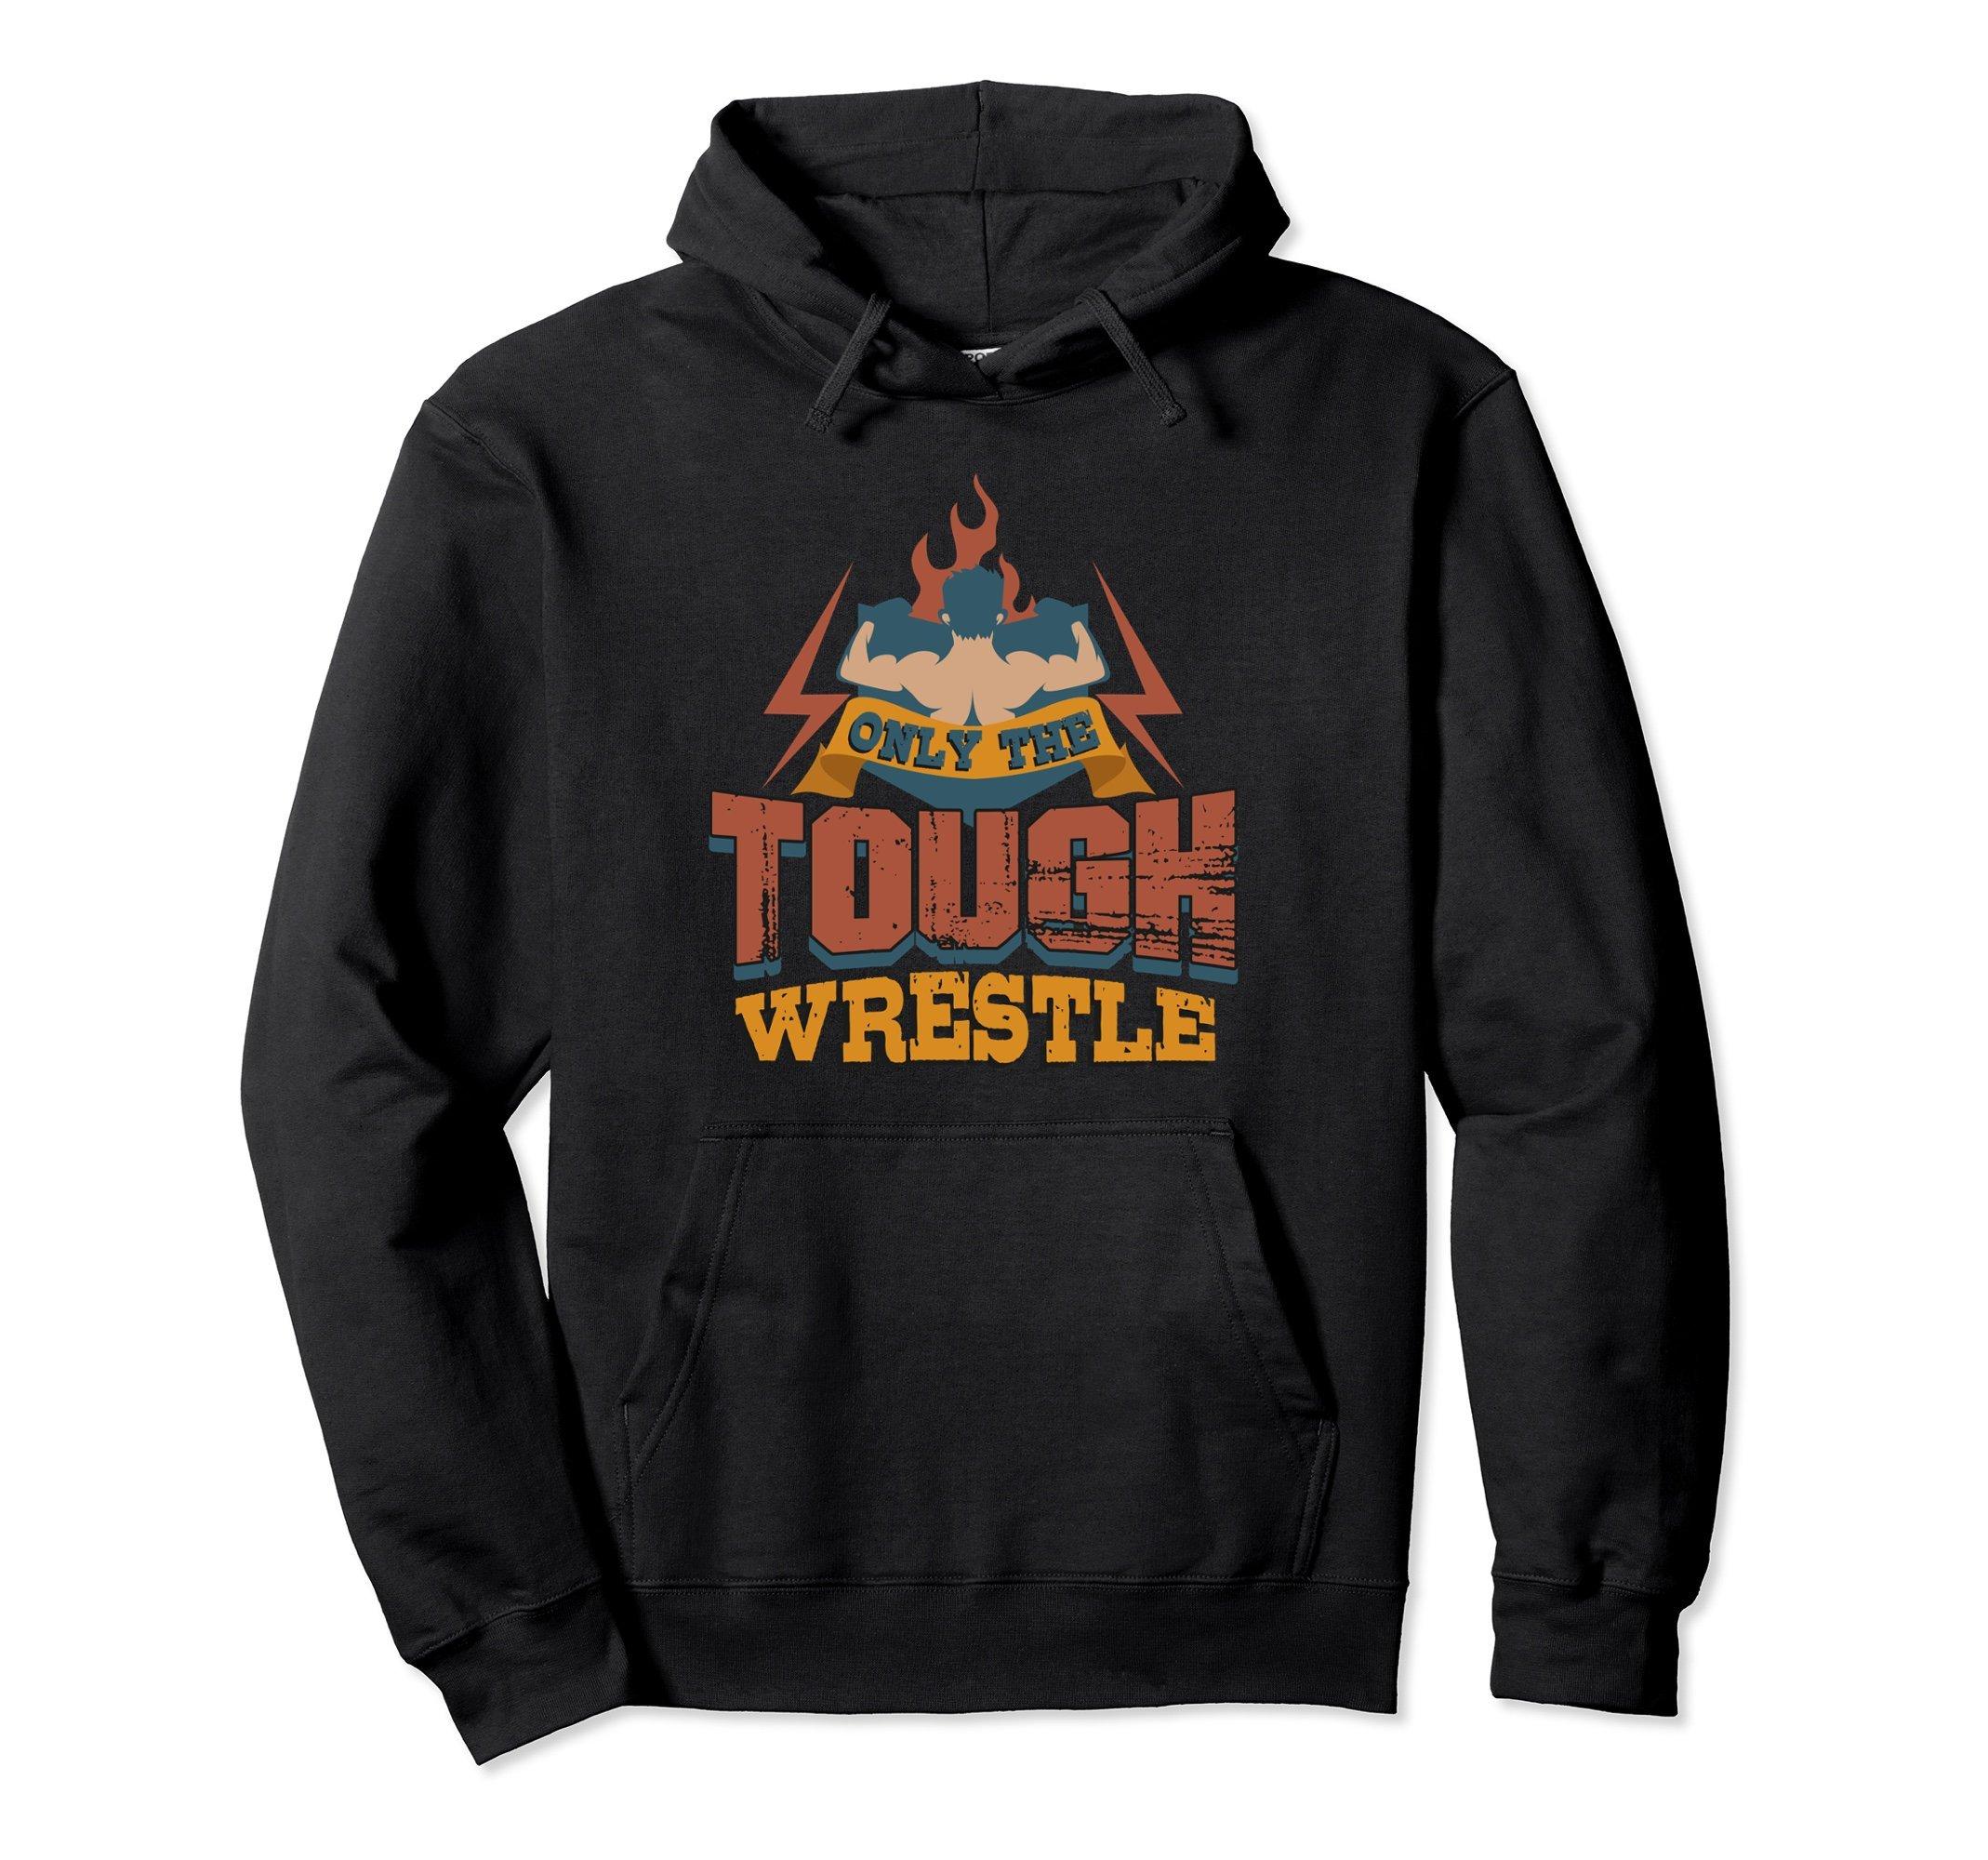 Unisex Only The Tough Wrestle Motivational Wrestling Hoodie Medium Black